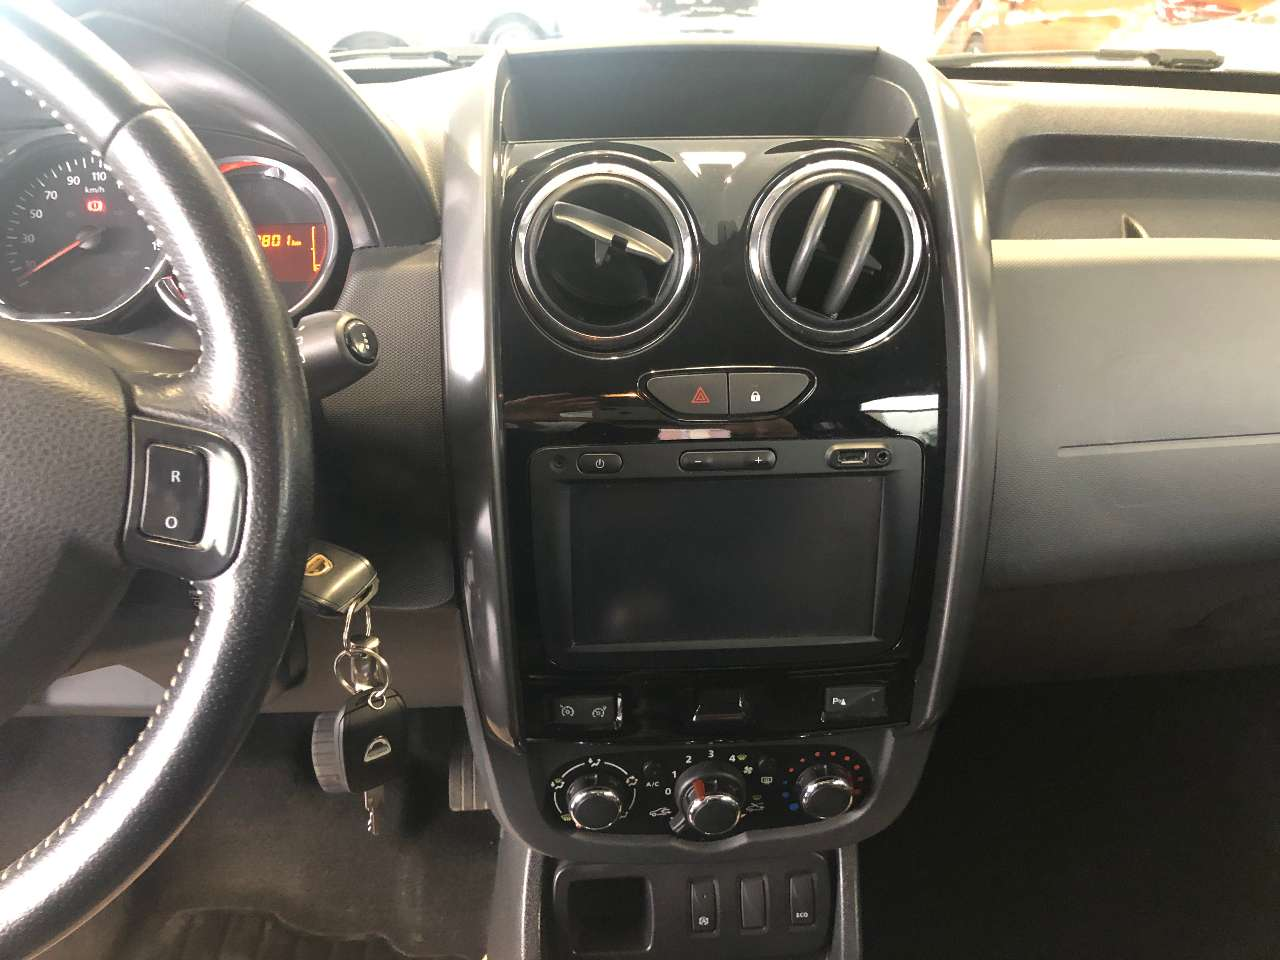 Dacia Duster 1.5 dCi 110CV 4×2 Prestige